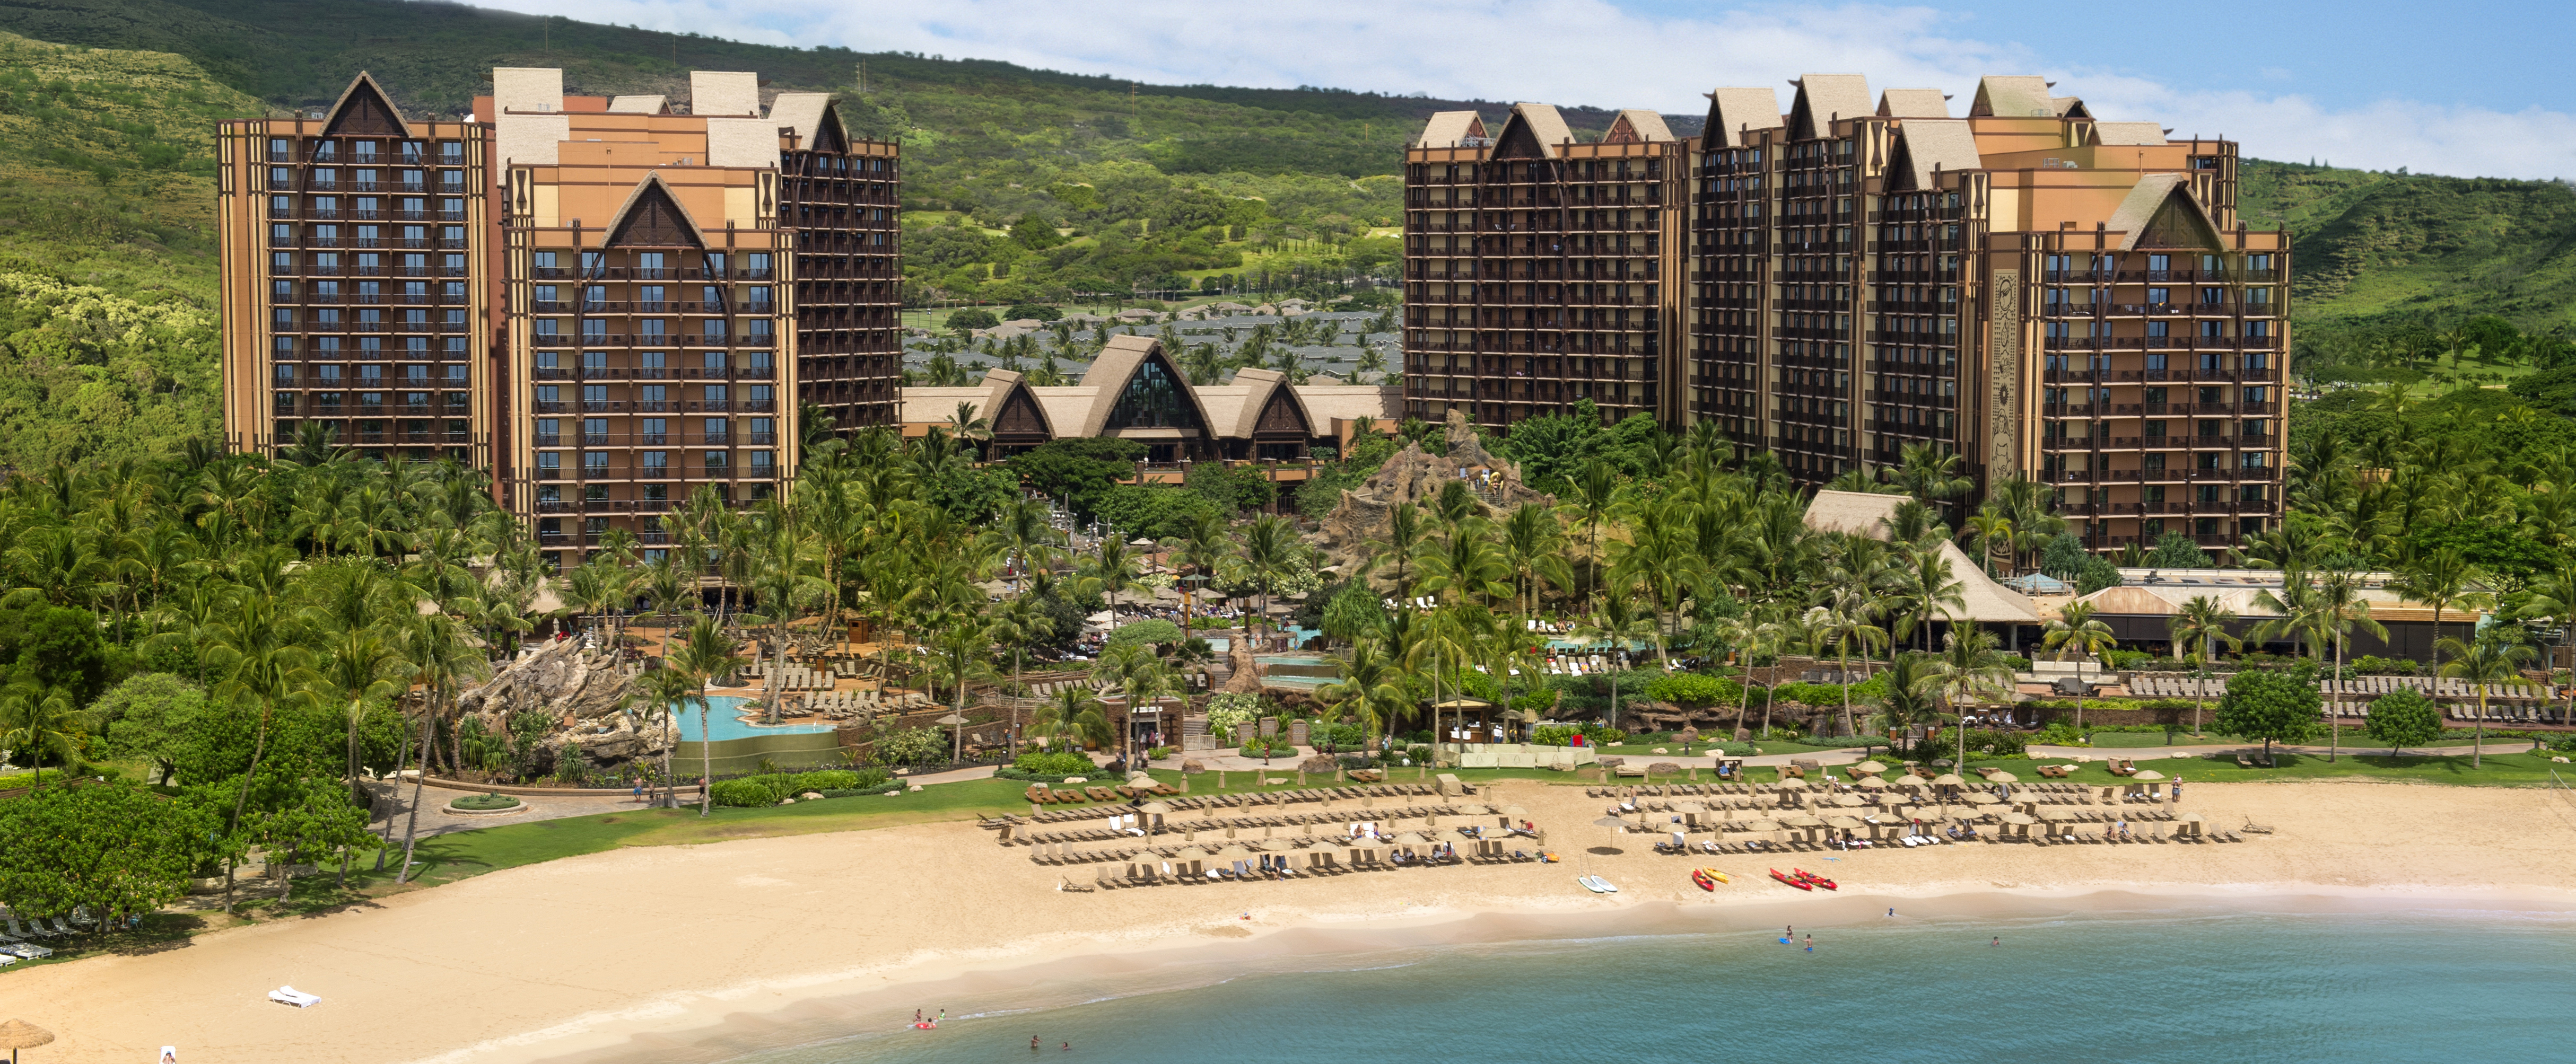 Aulani, A Disney Resort & Spa, located on Ko Olina Beach in O'ahu